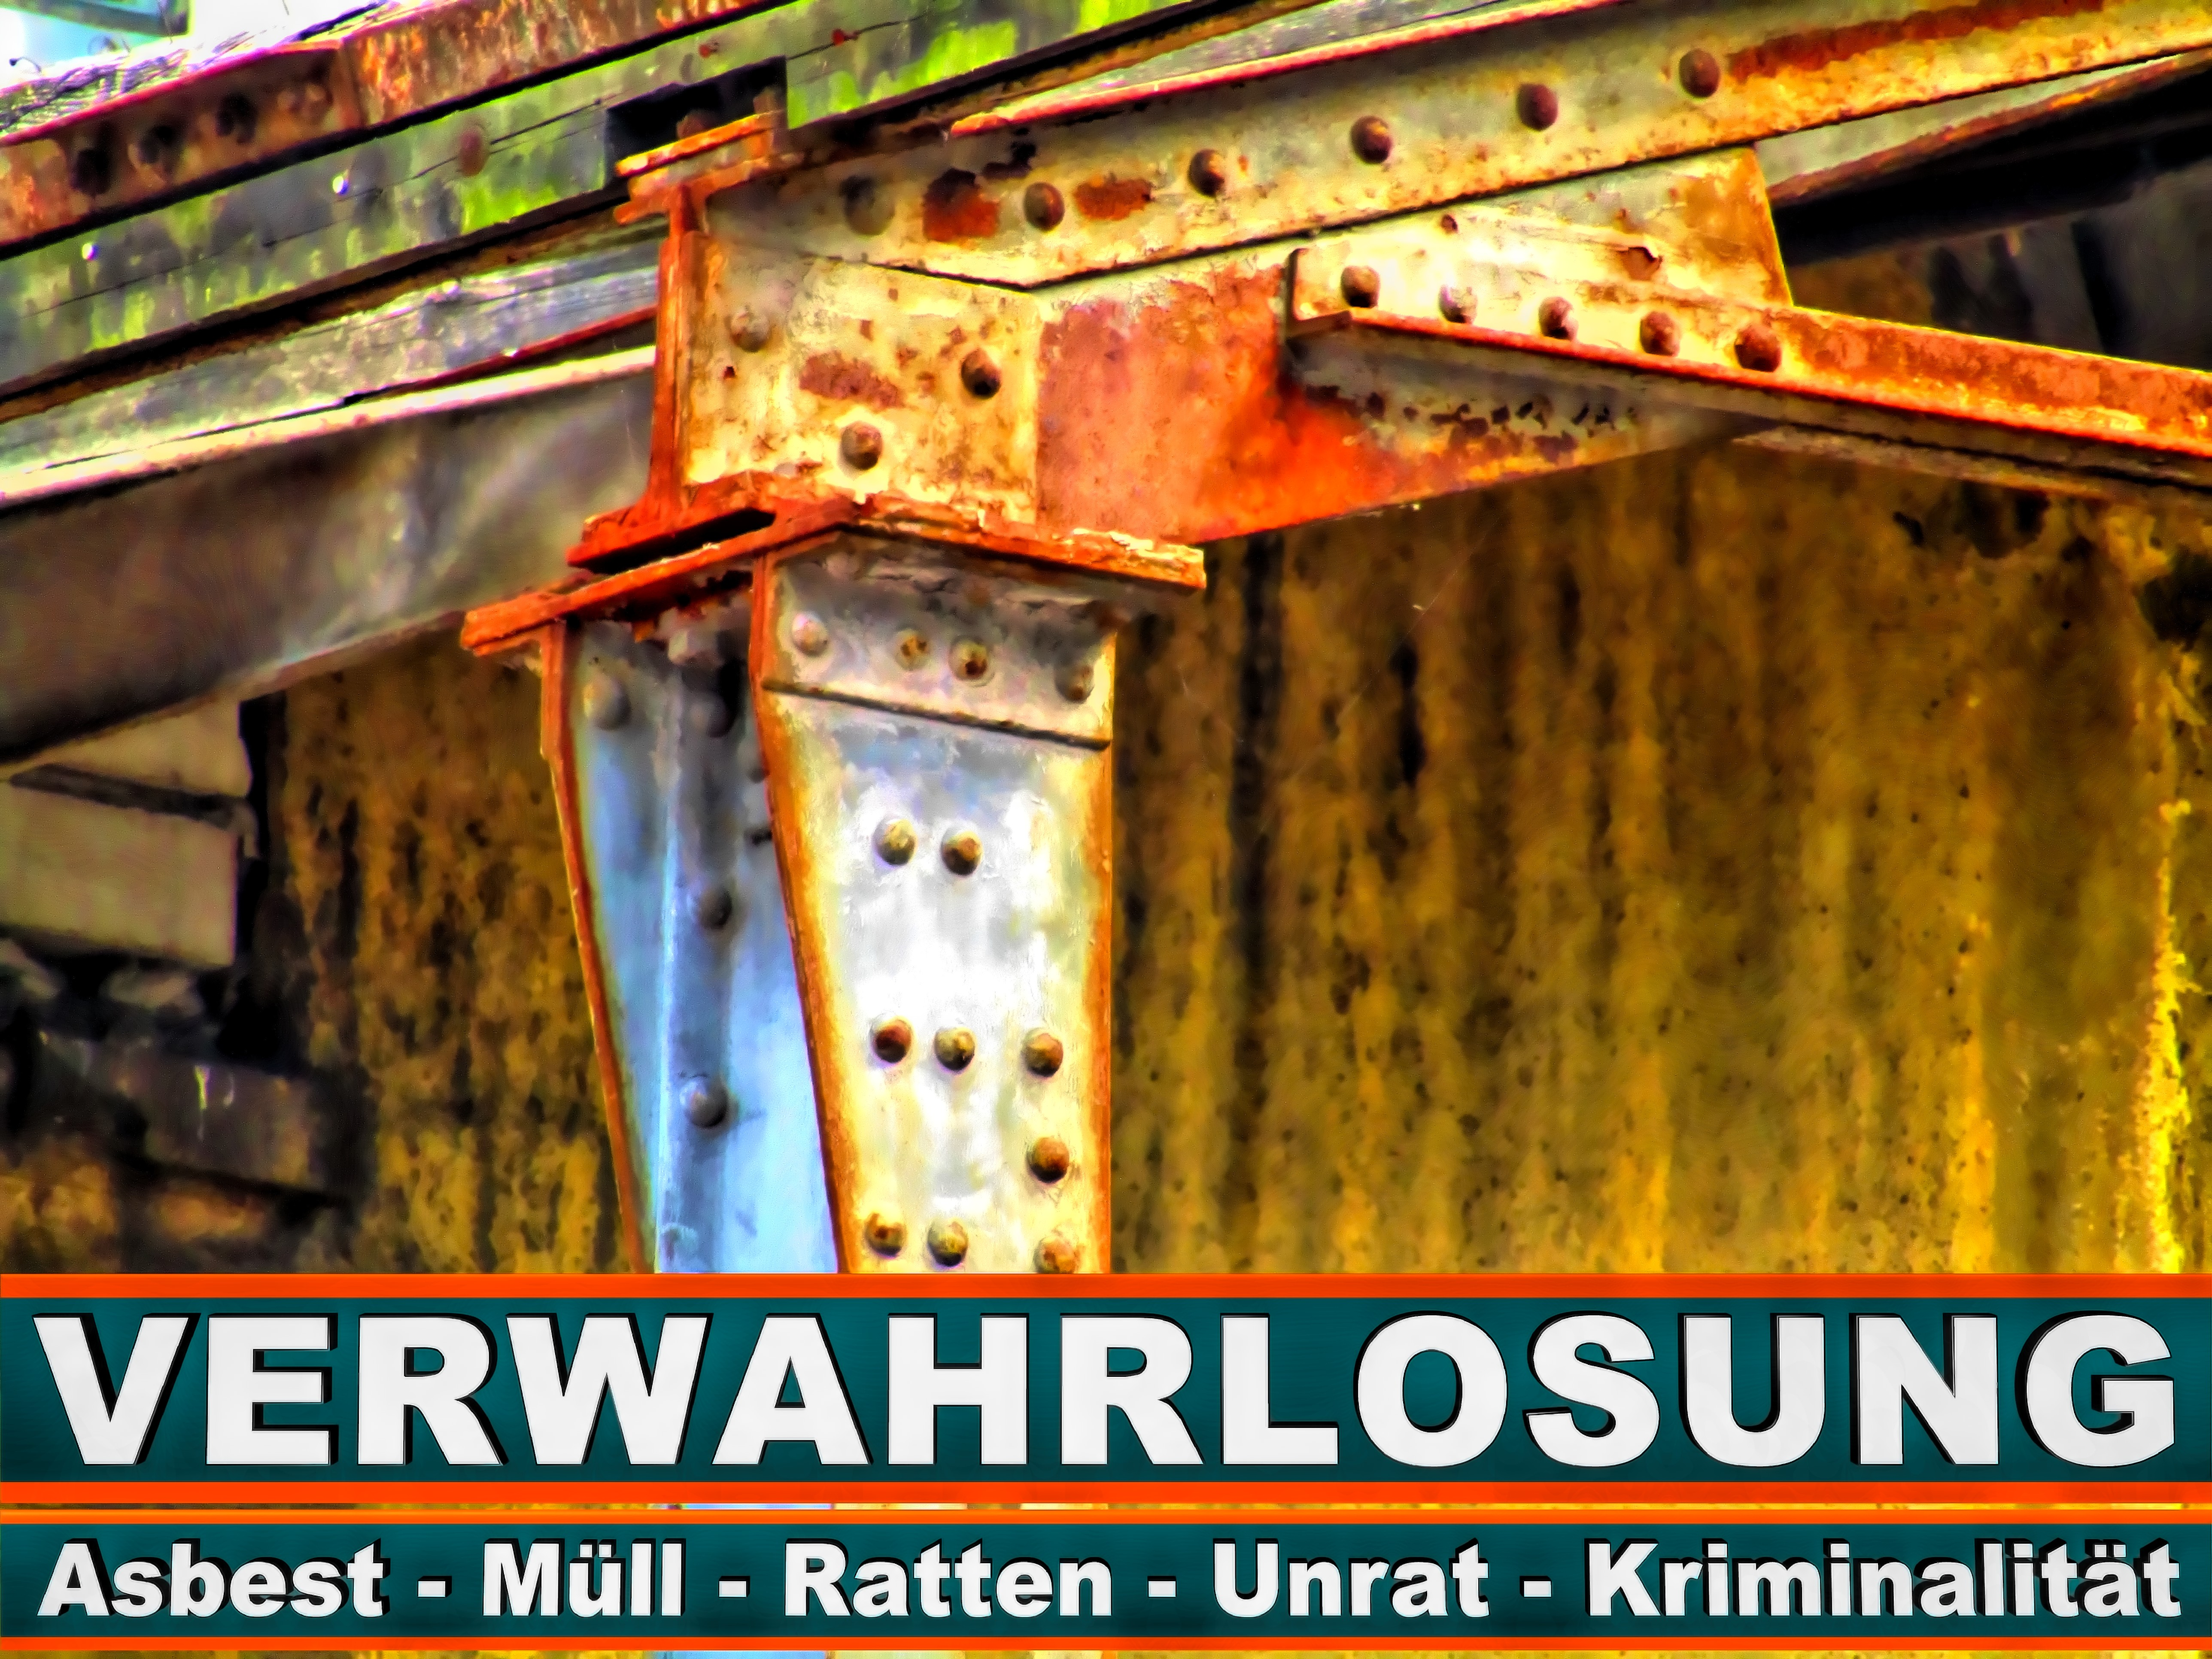 Öko Tech Park Bielefeld CAR WASH CENTER Deniz Özdemir Wilhelmsdorfer Str 007